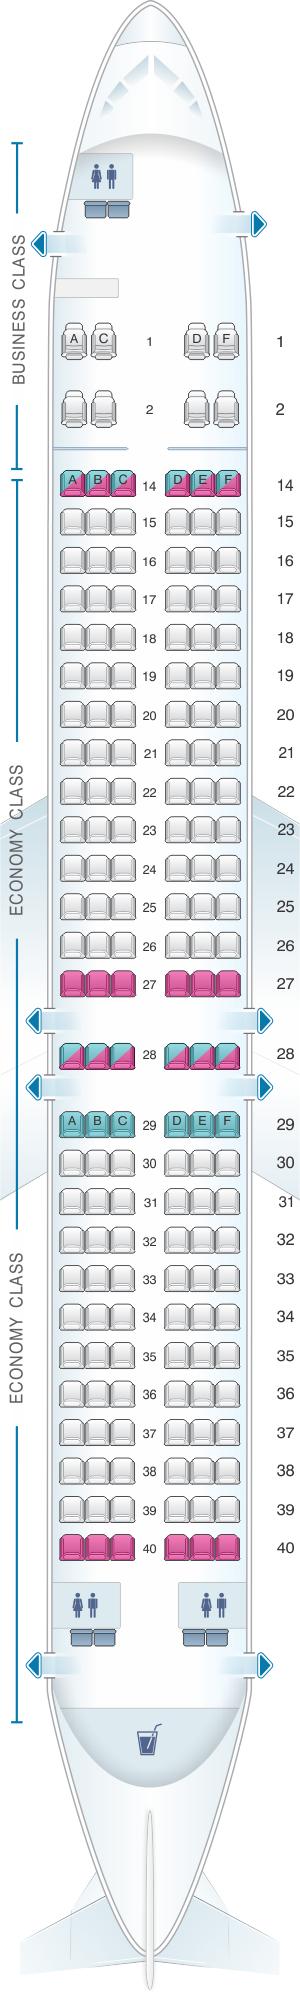 Seat map for Fiji Airways Boeing B737 MAX 8